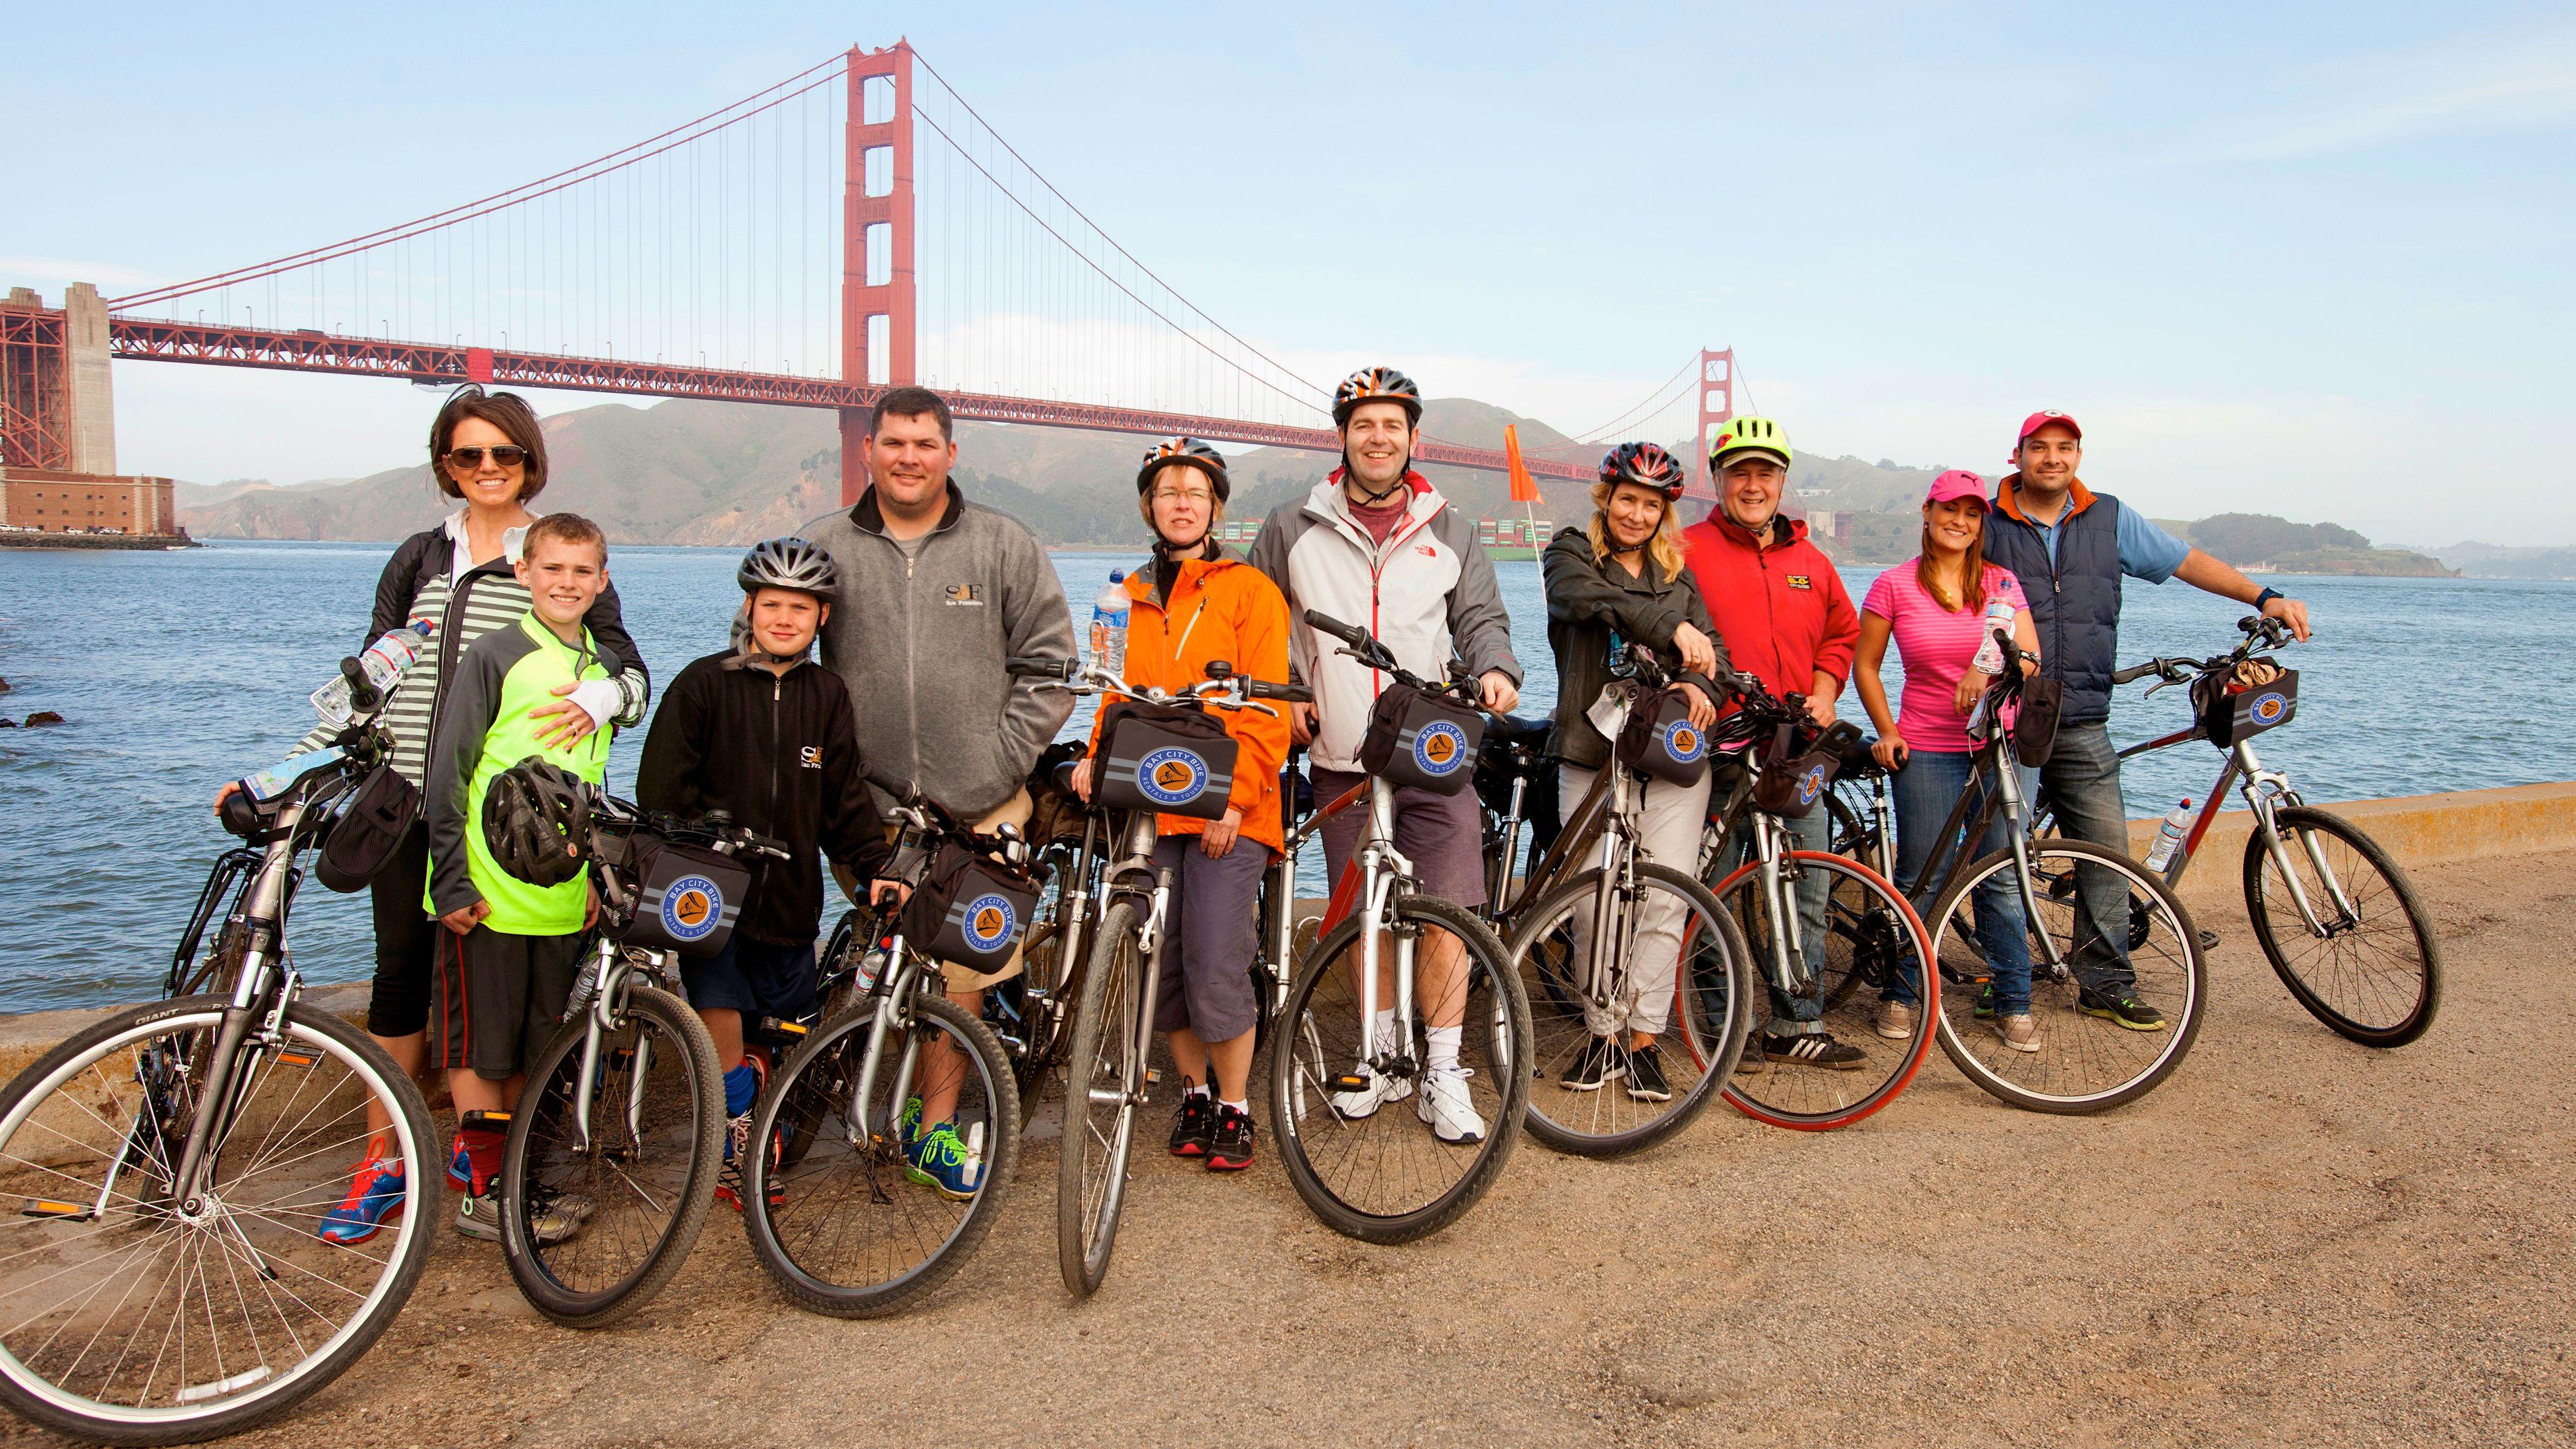 Guidet cykeltur fra Golden Gate Bridge til Sausalito